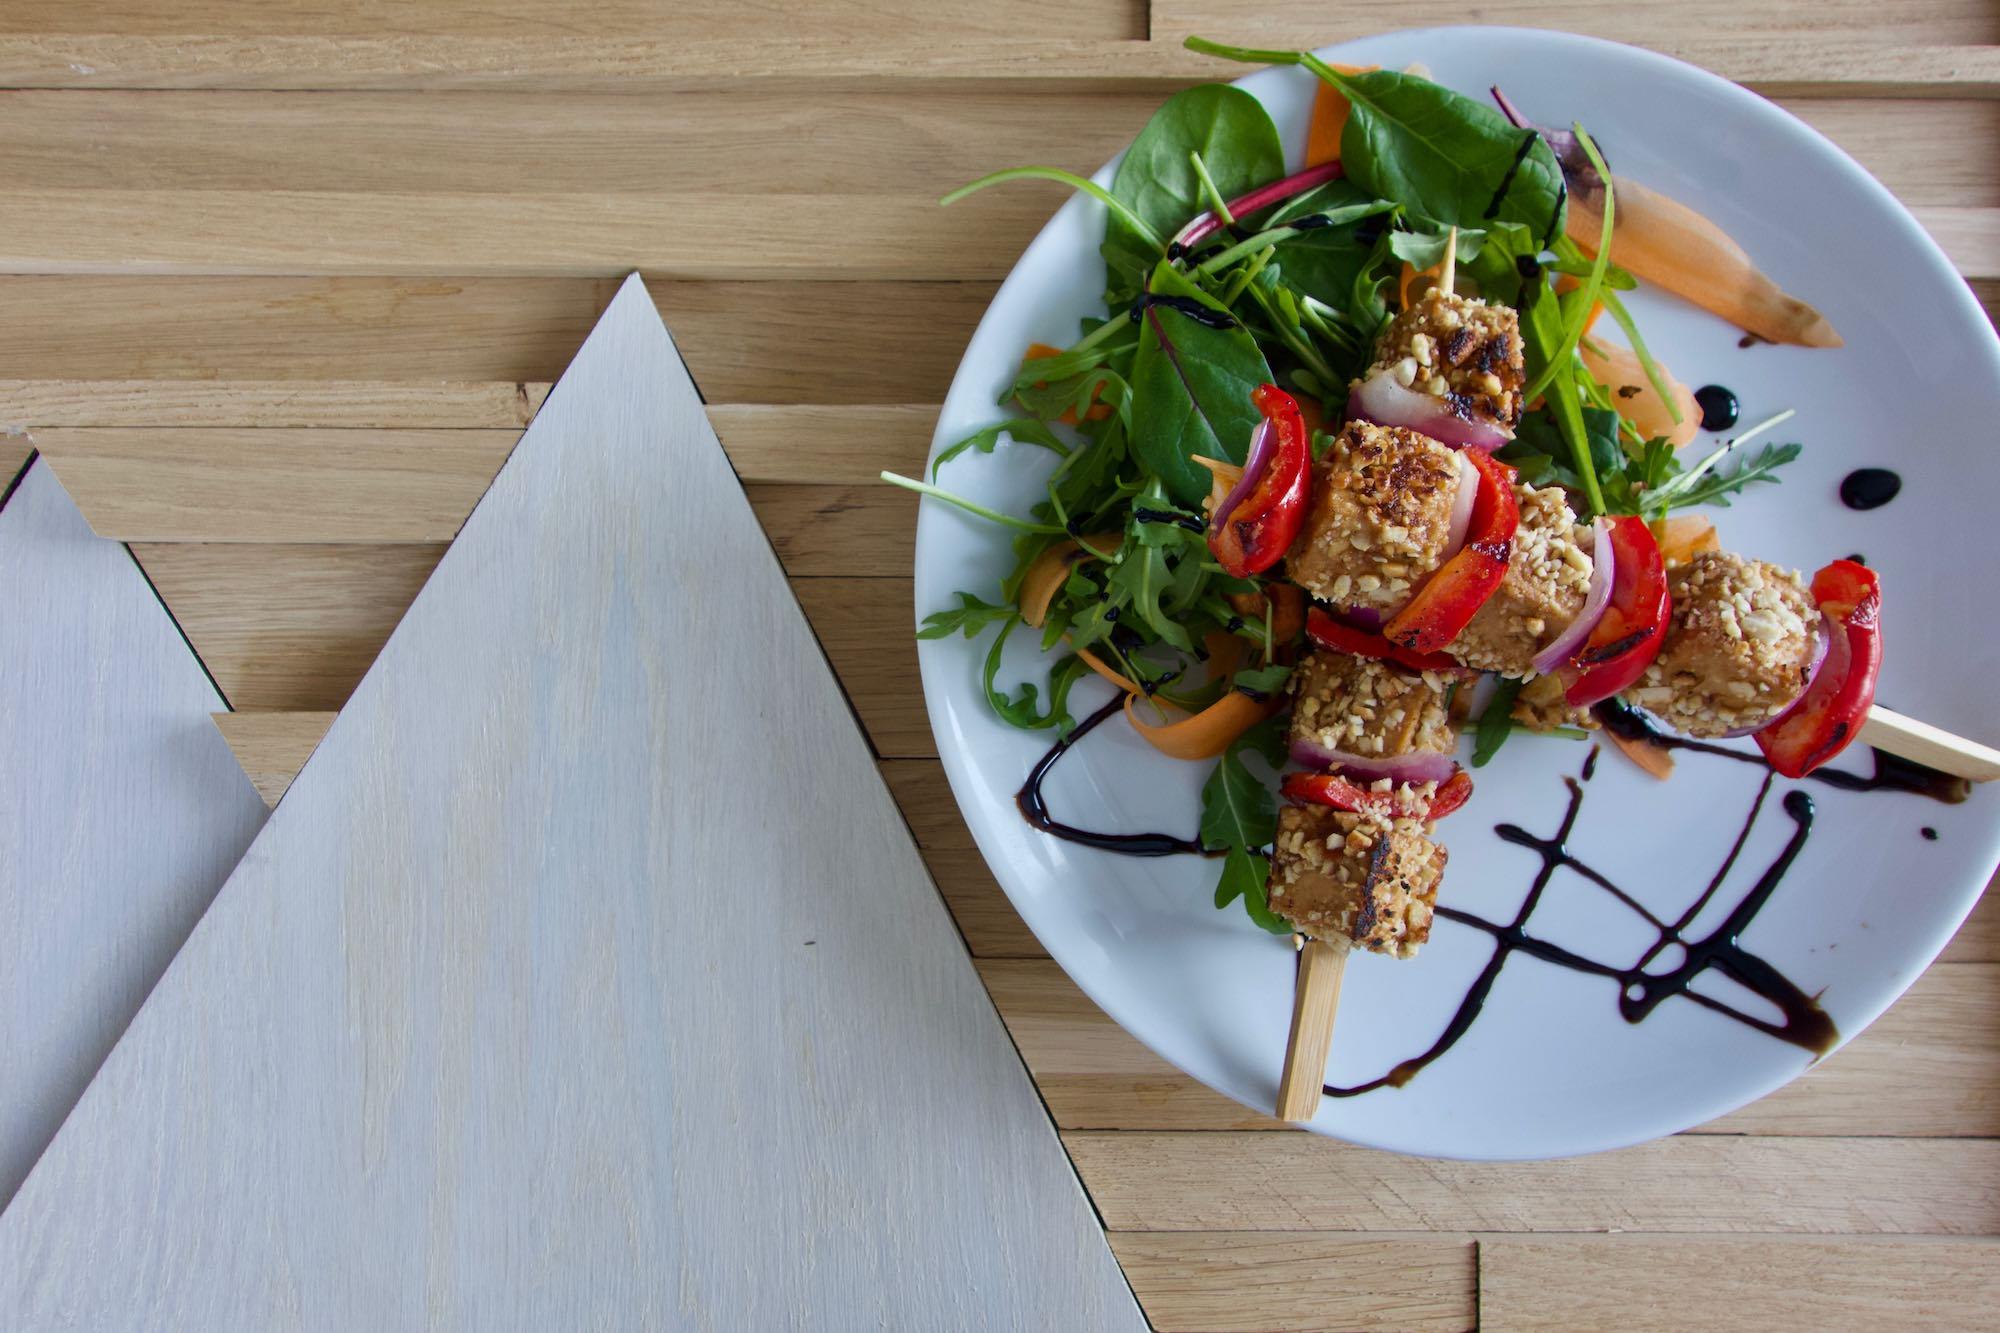 Tofu Skewers with Mango Sauce